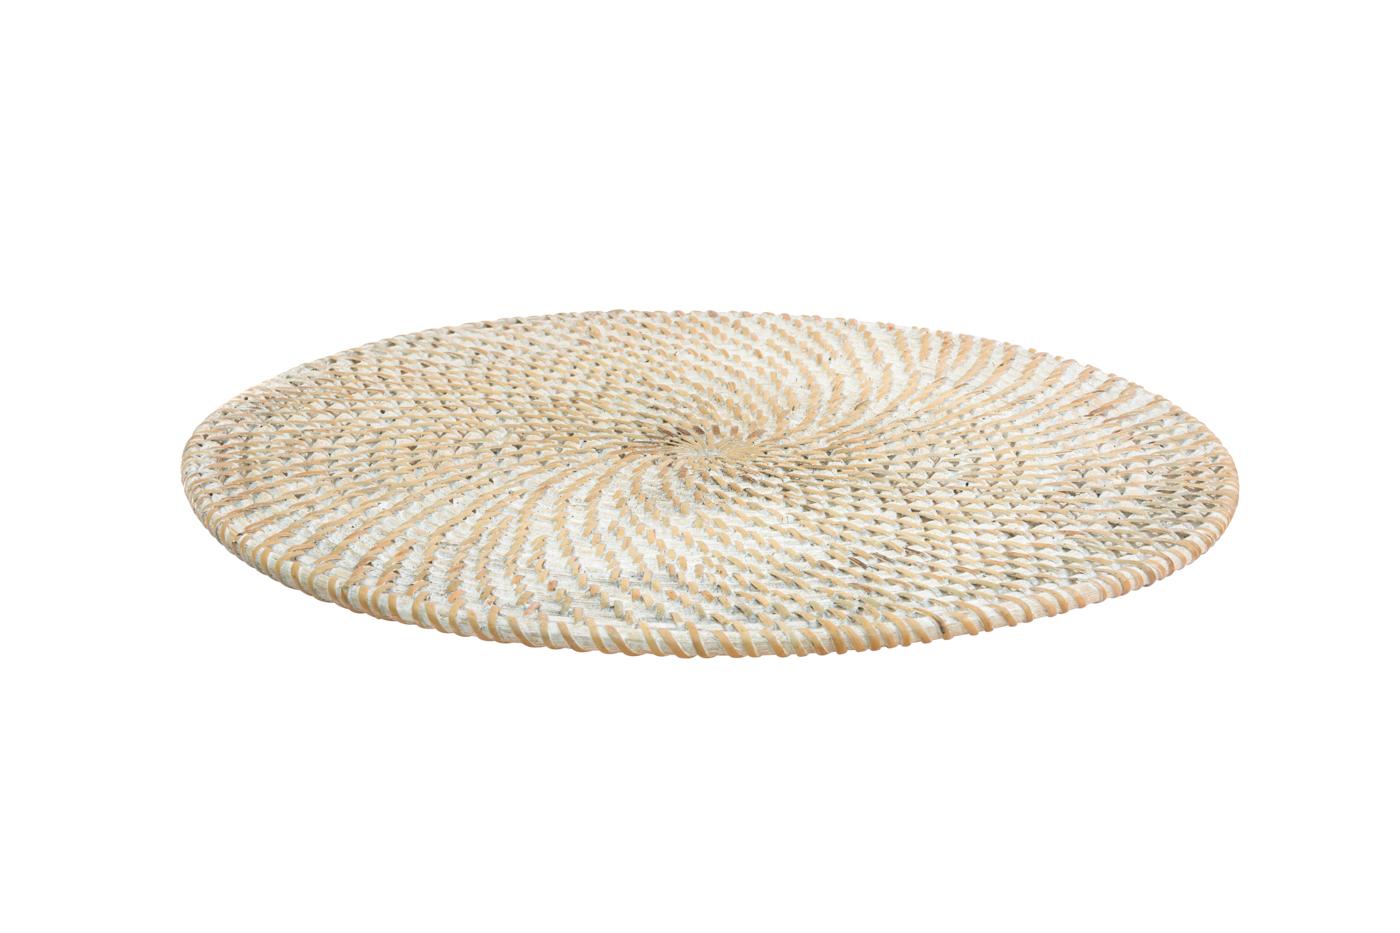 Whitewash round placemat